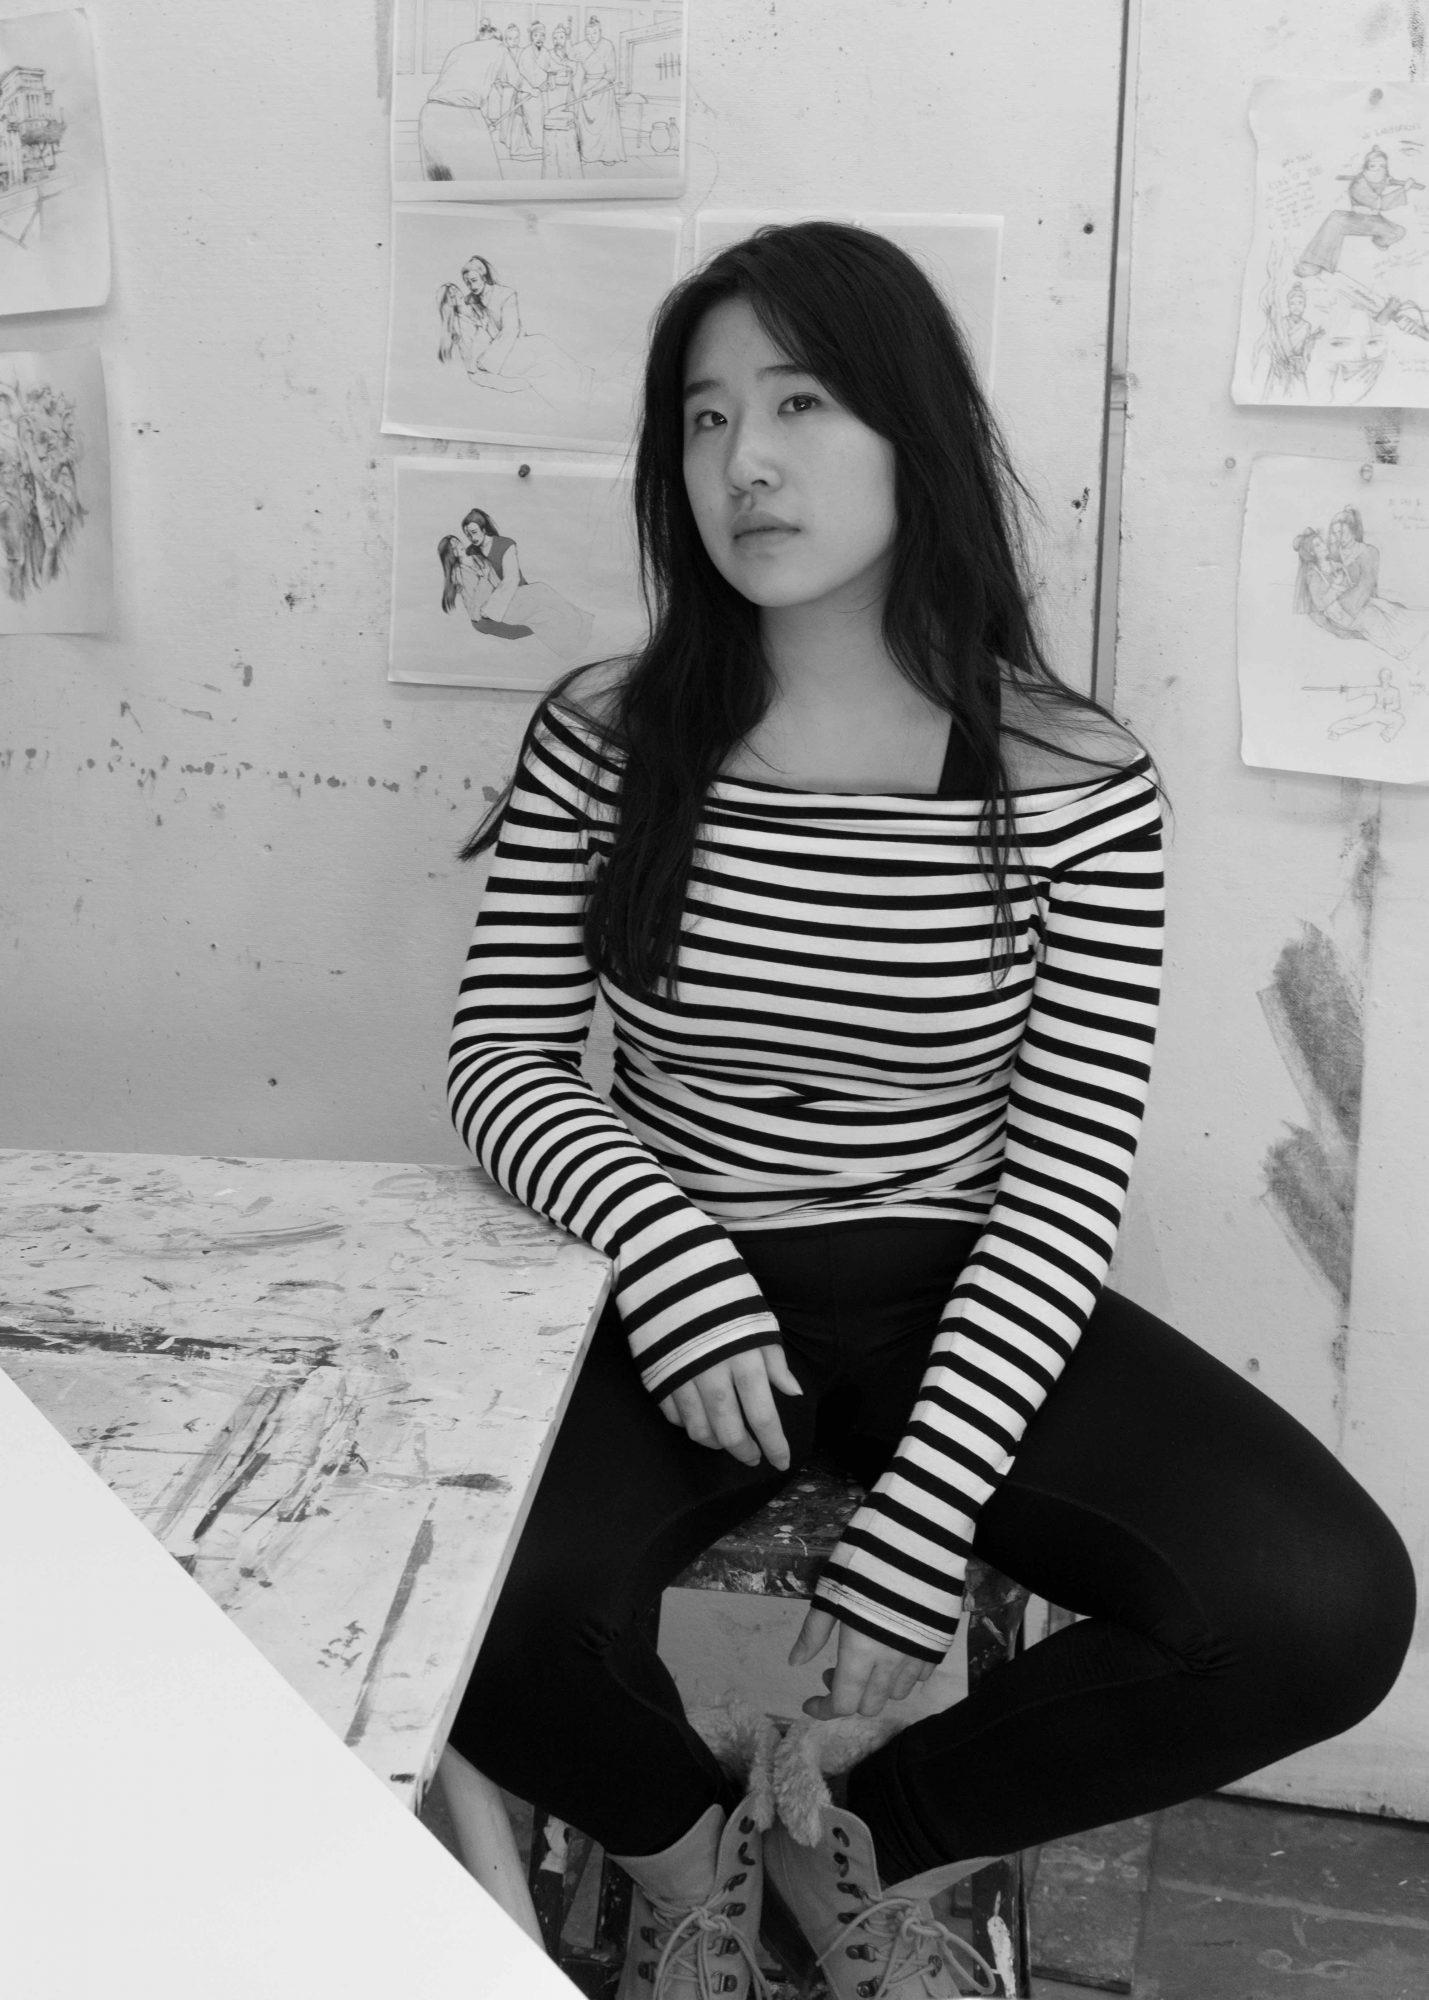 Jessica Chenp hoto by Hudson Bohr